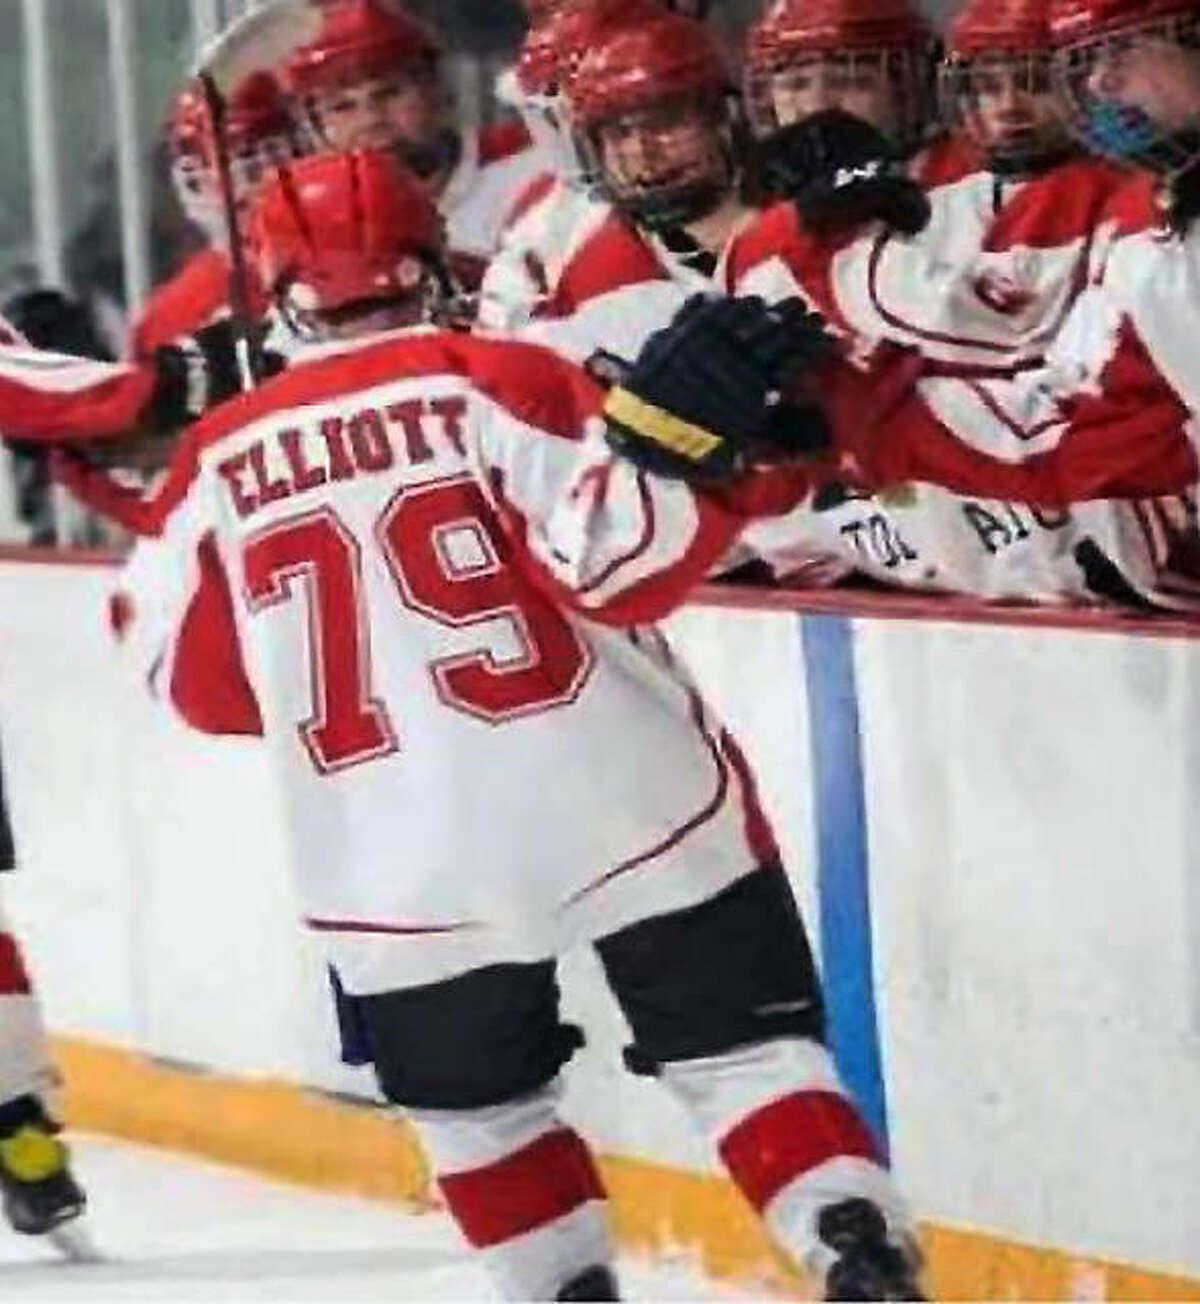 Alton's Aiden Elliott skates past the Redbirds bench after scoring goal as his teammates celebrate.